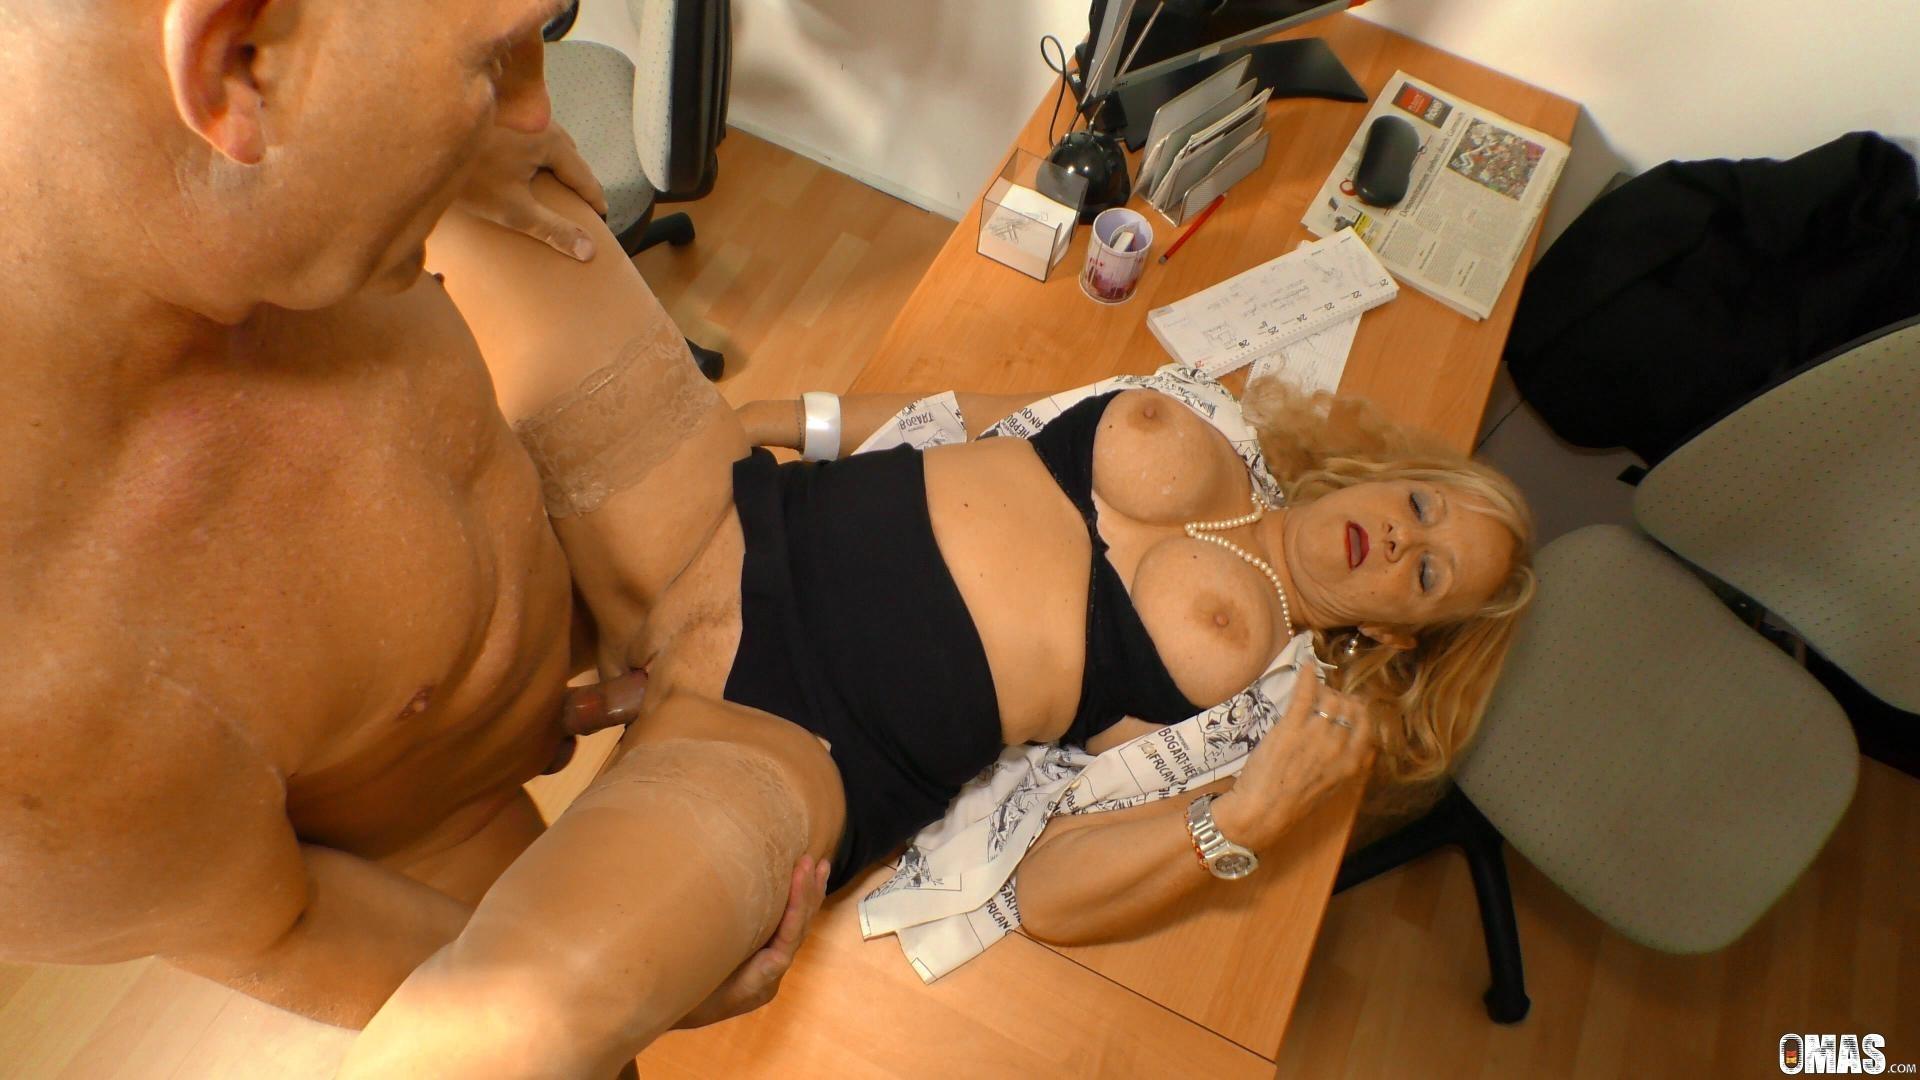 erotic-underwear-mature-secretary-fucking-home-sex